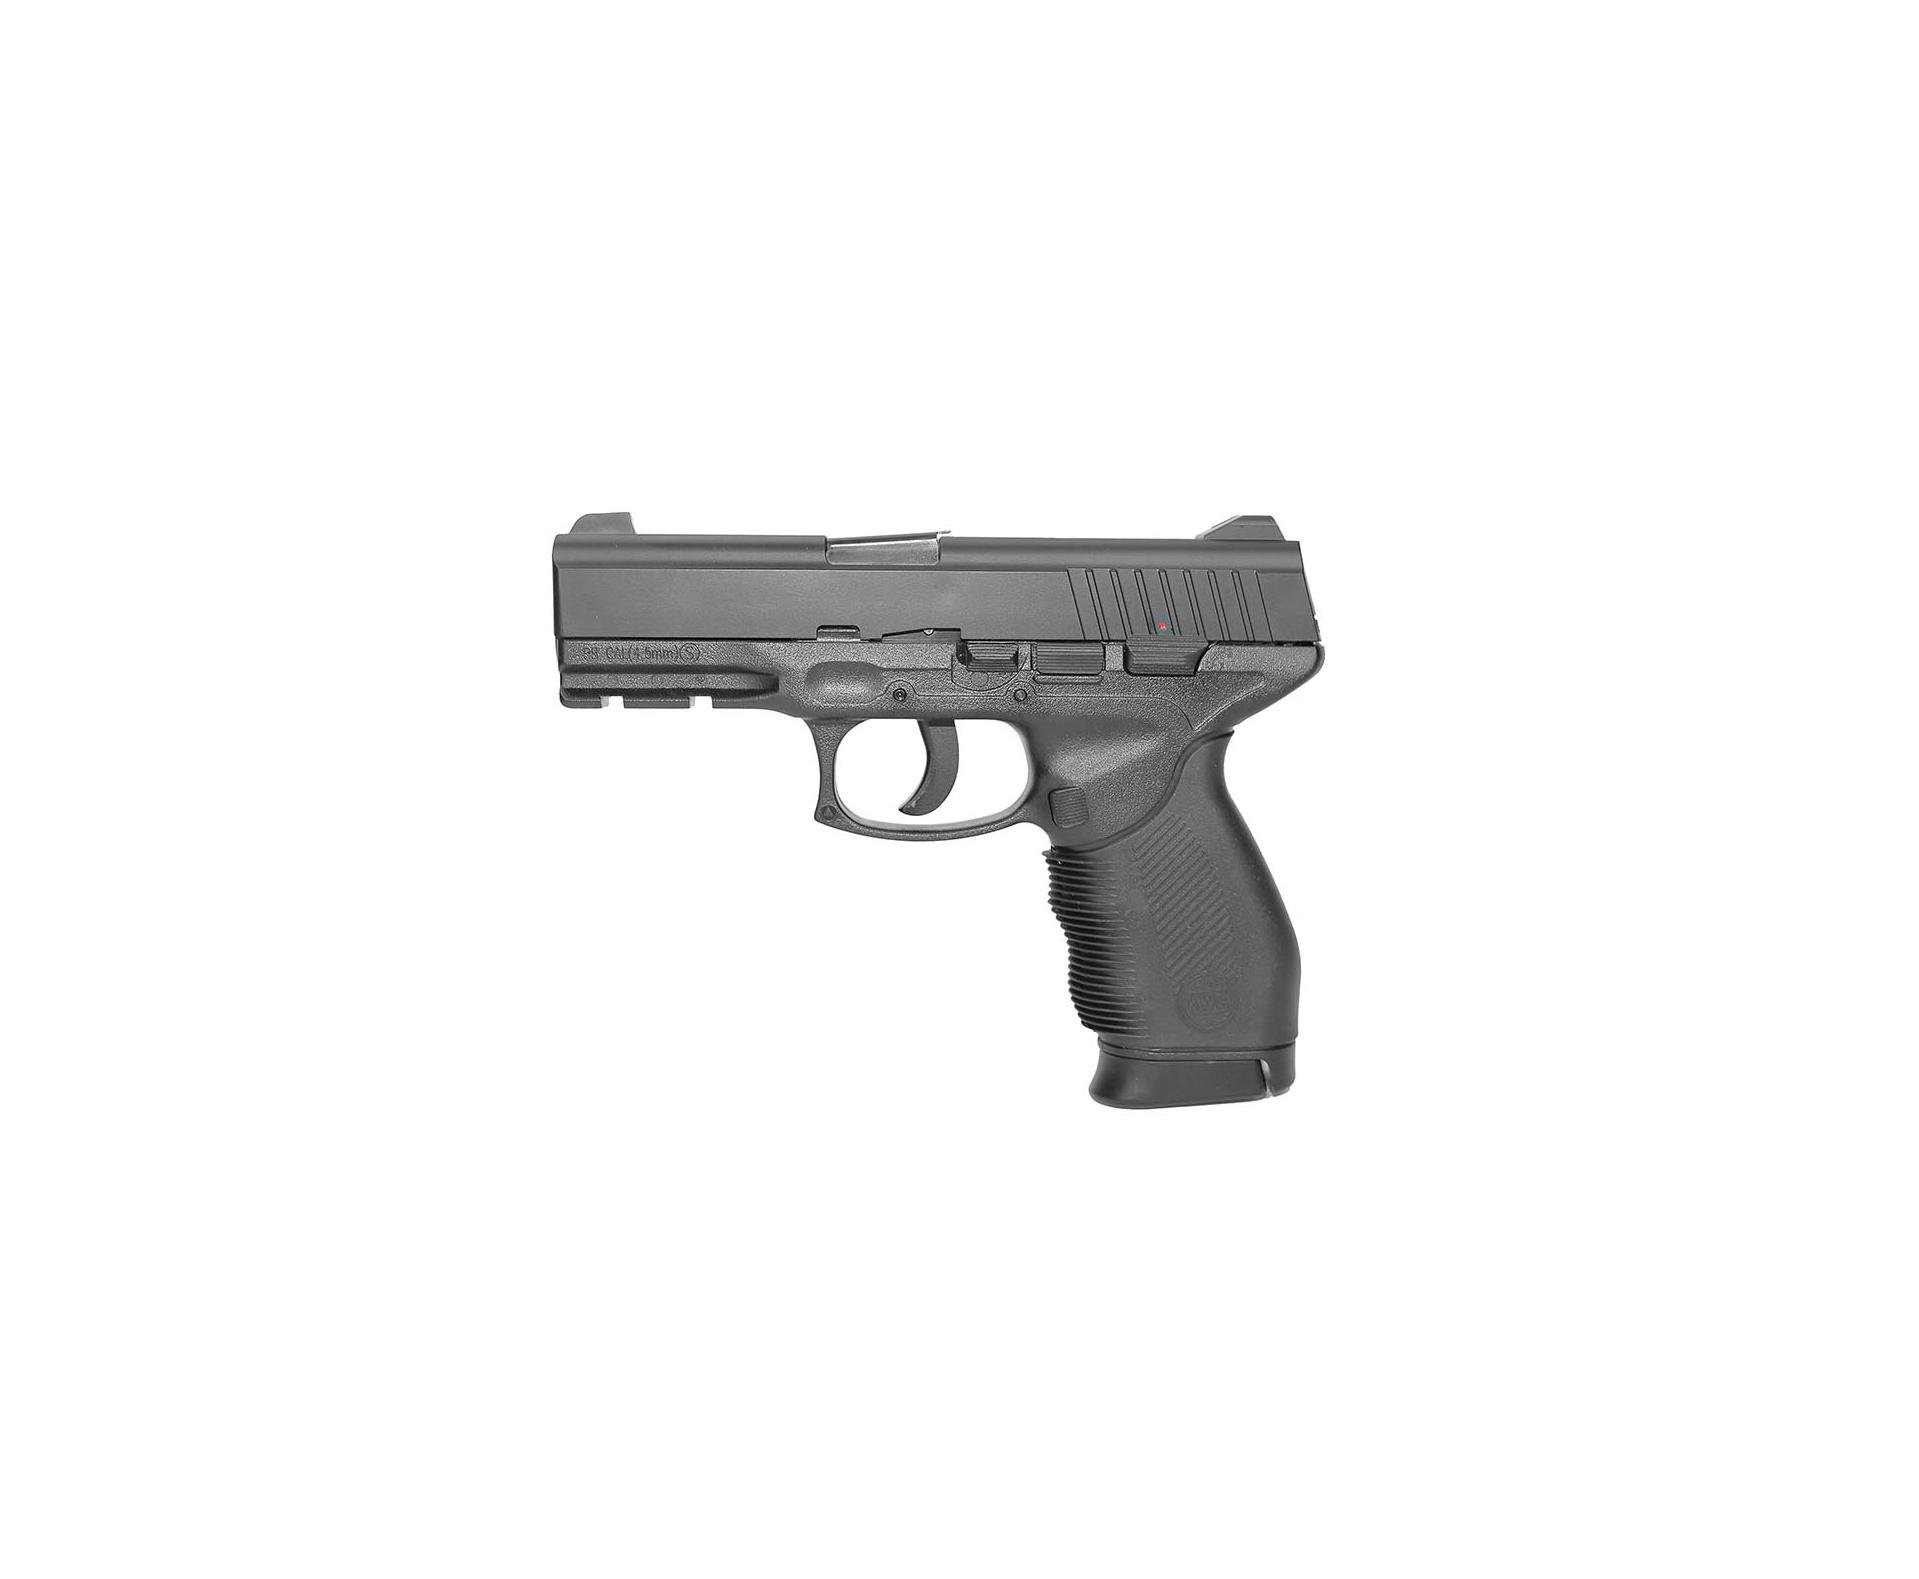 Pistola De Pressão Gas Co2 24/7 4,5mm Kwc